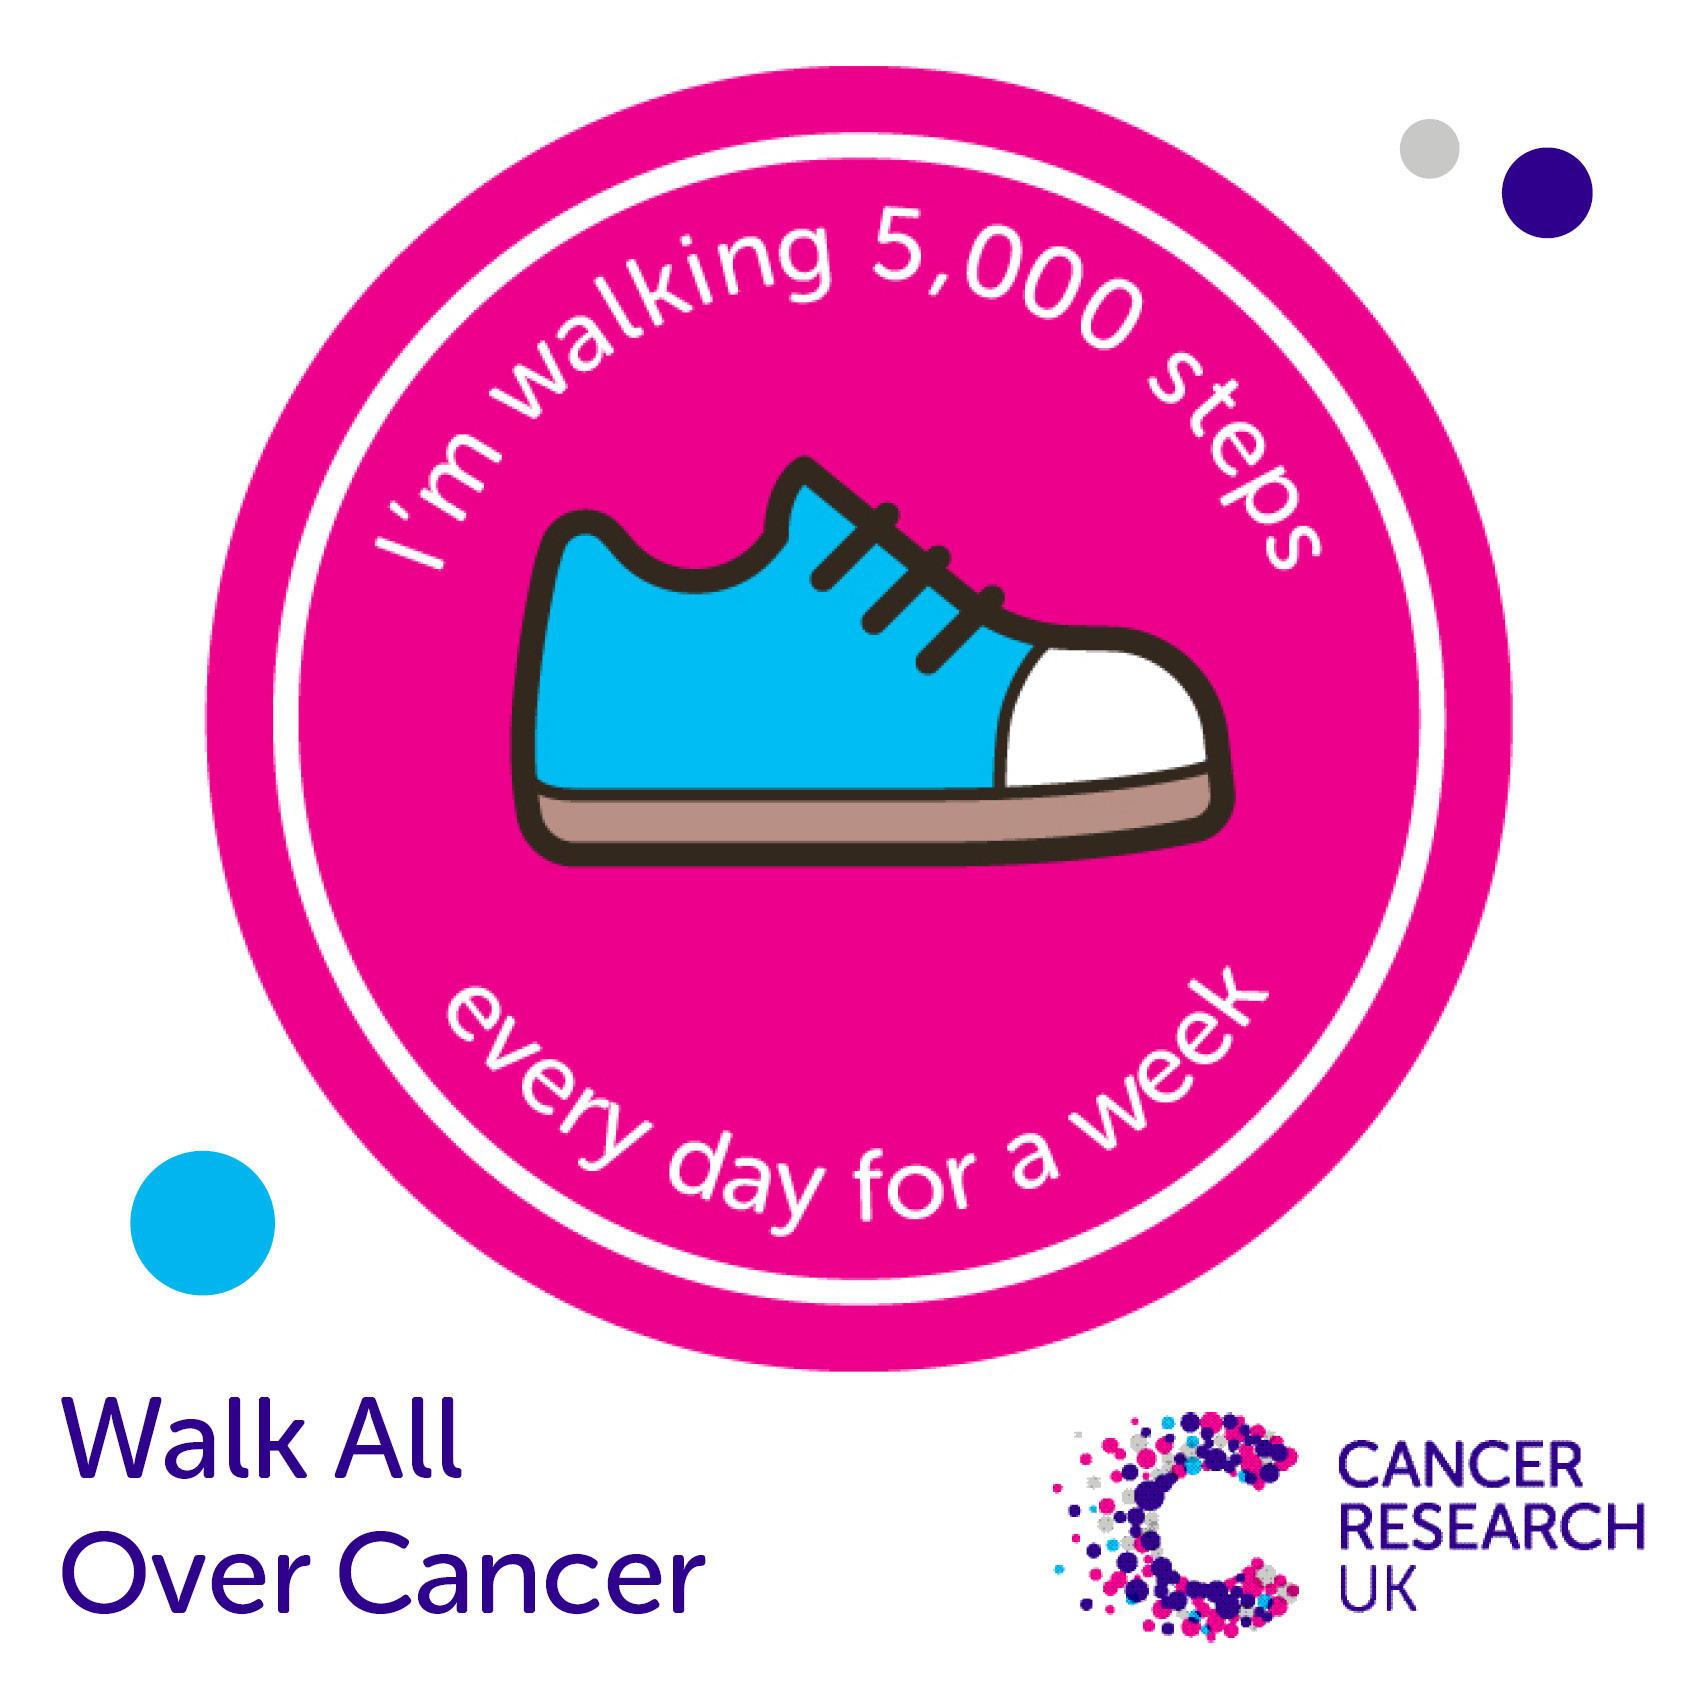 WAOC 5,000 steps a day.